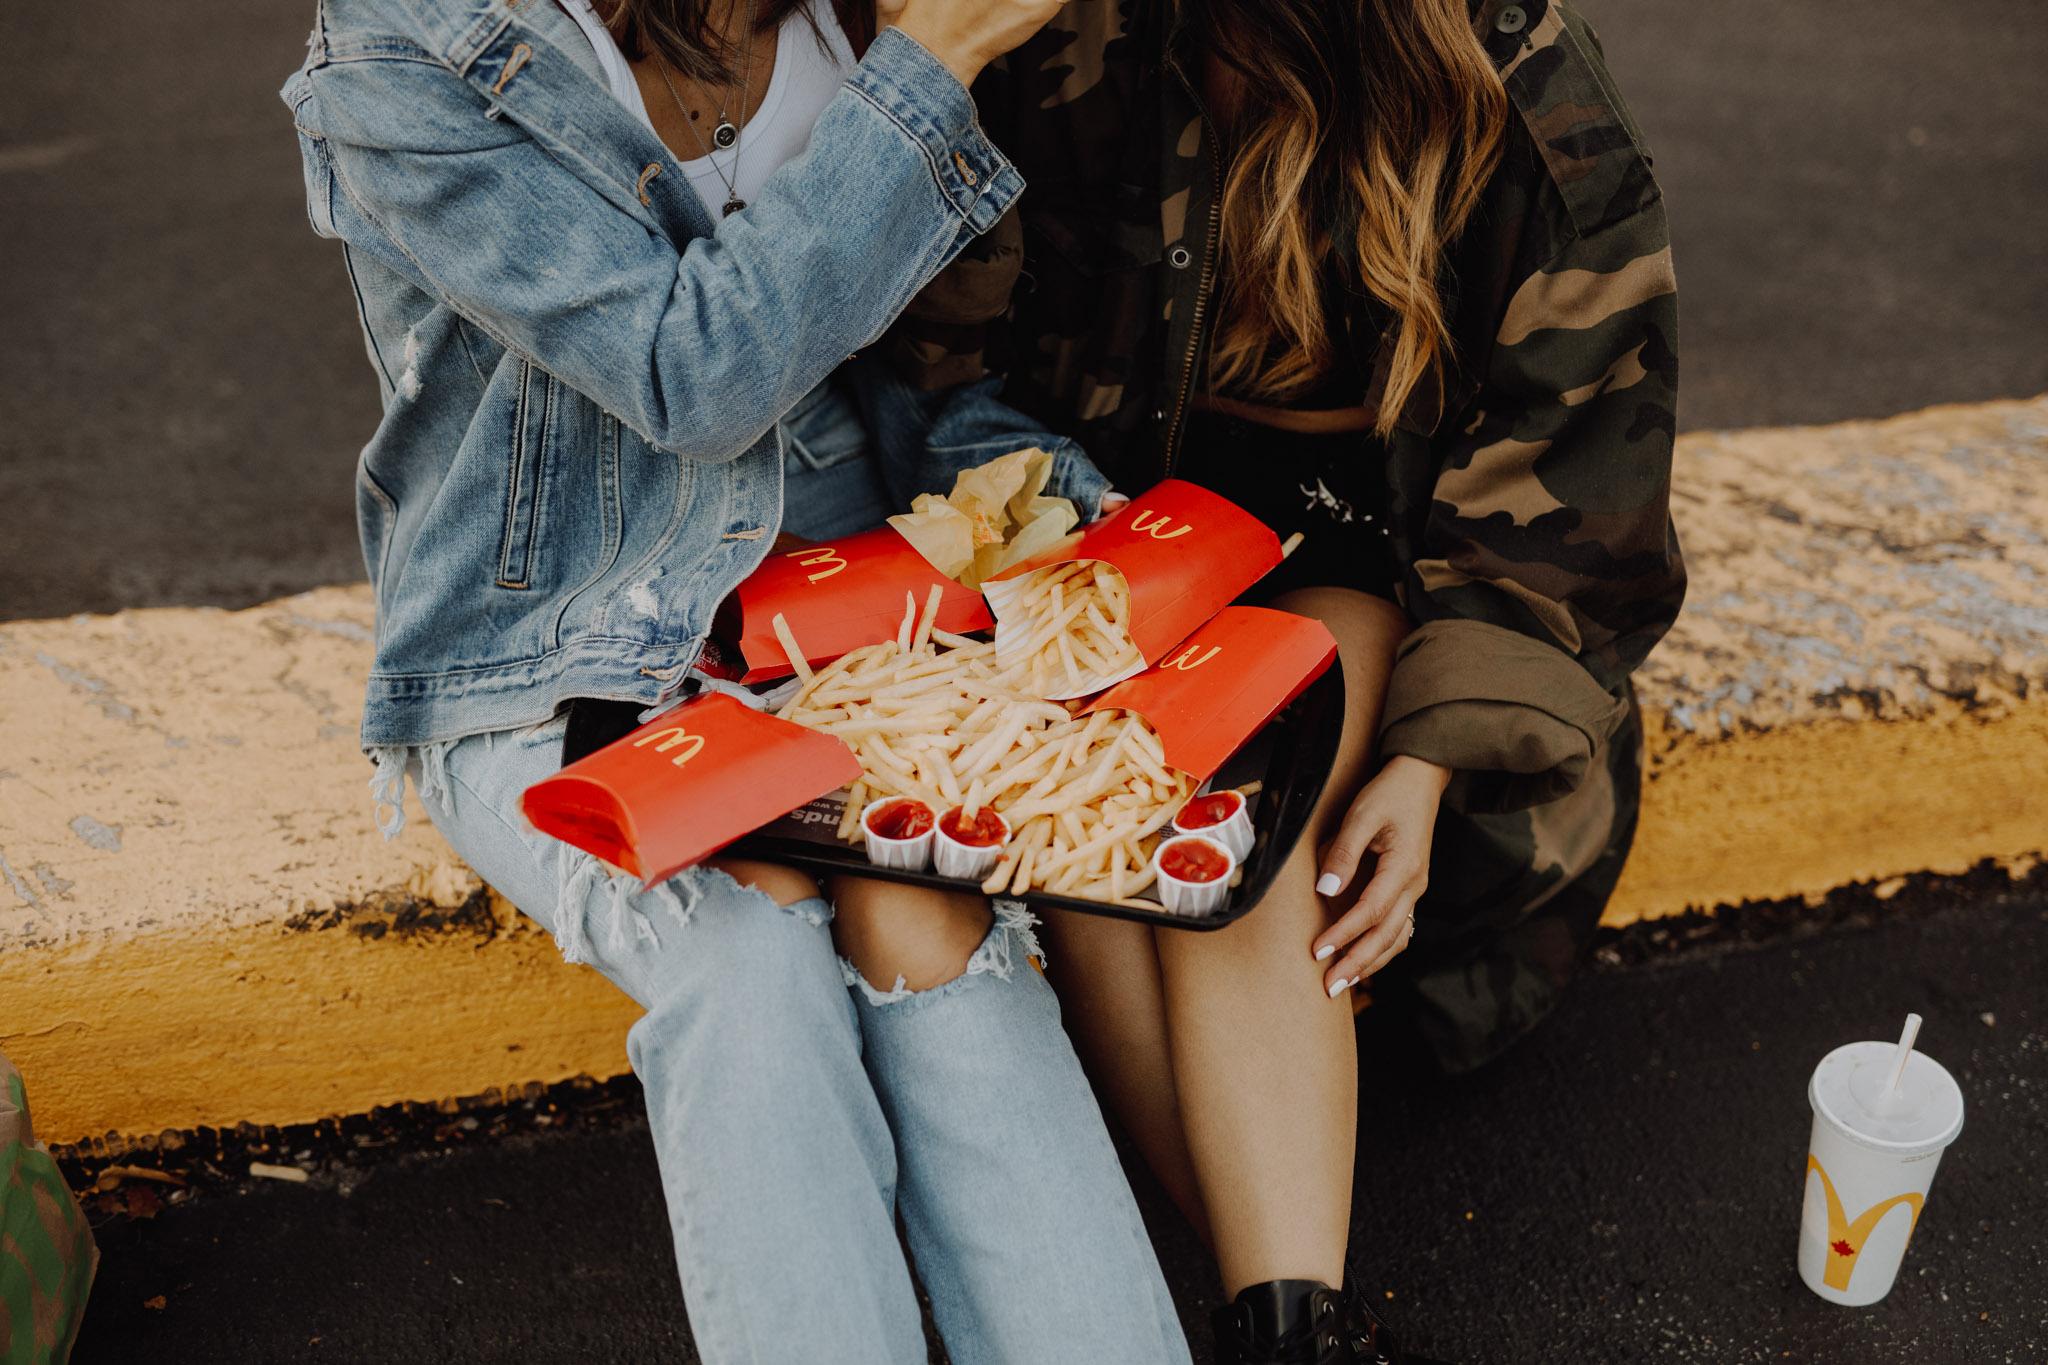 Mcdonalds engagement session - lap full of fries